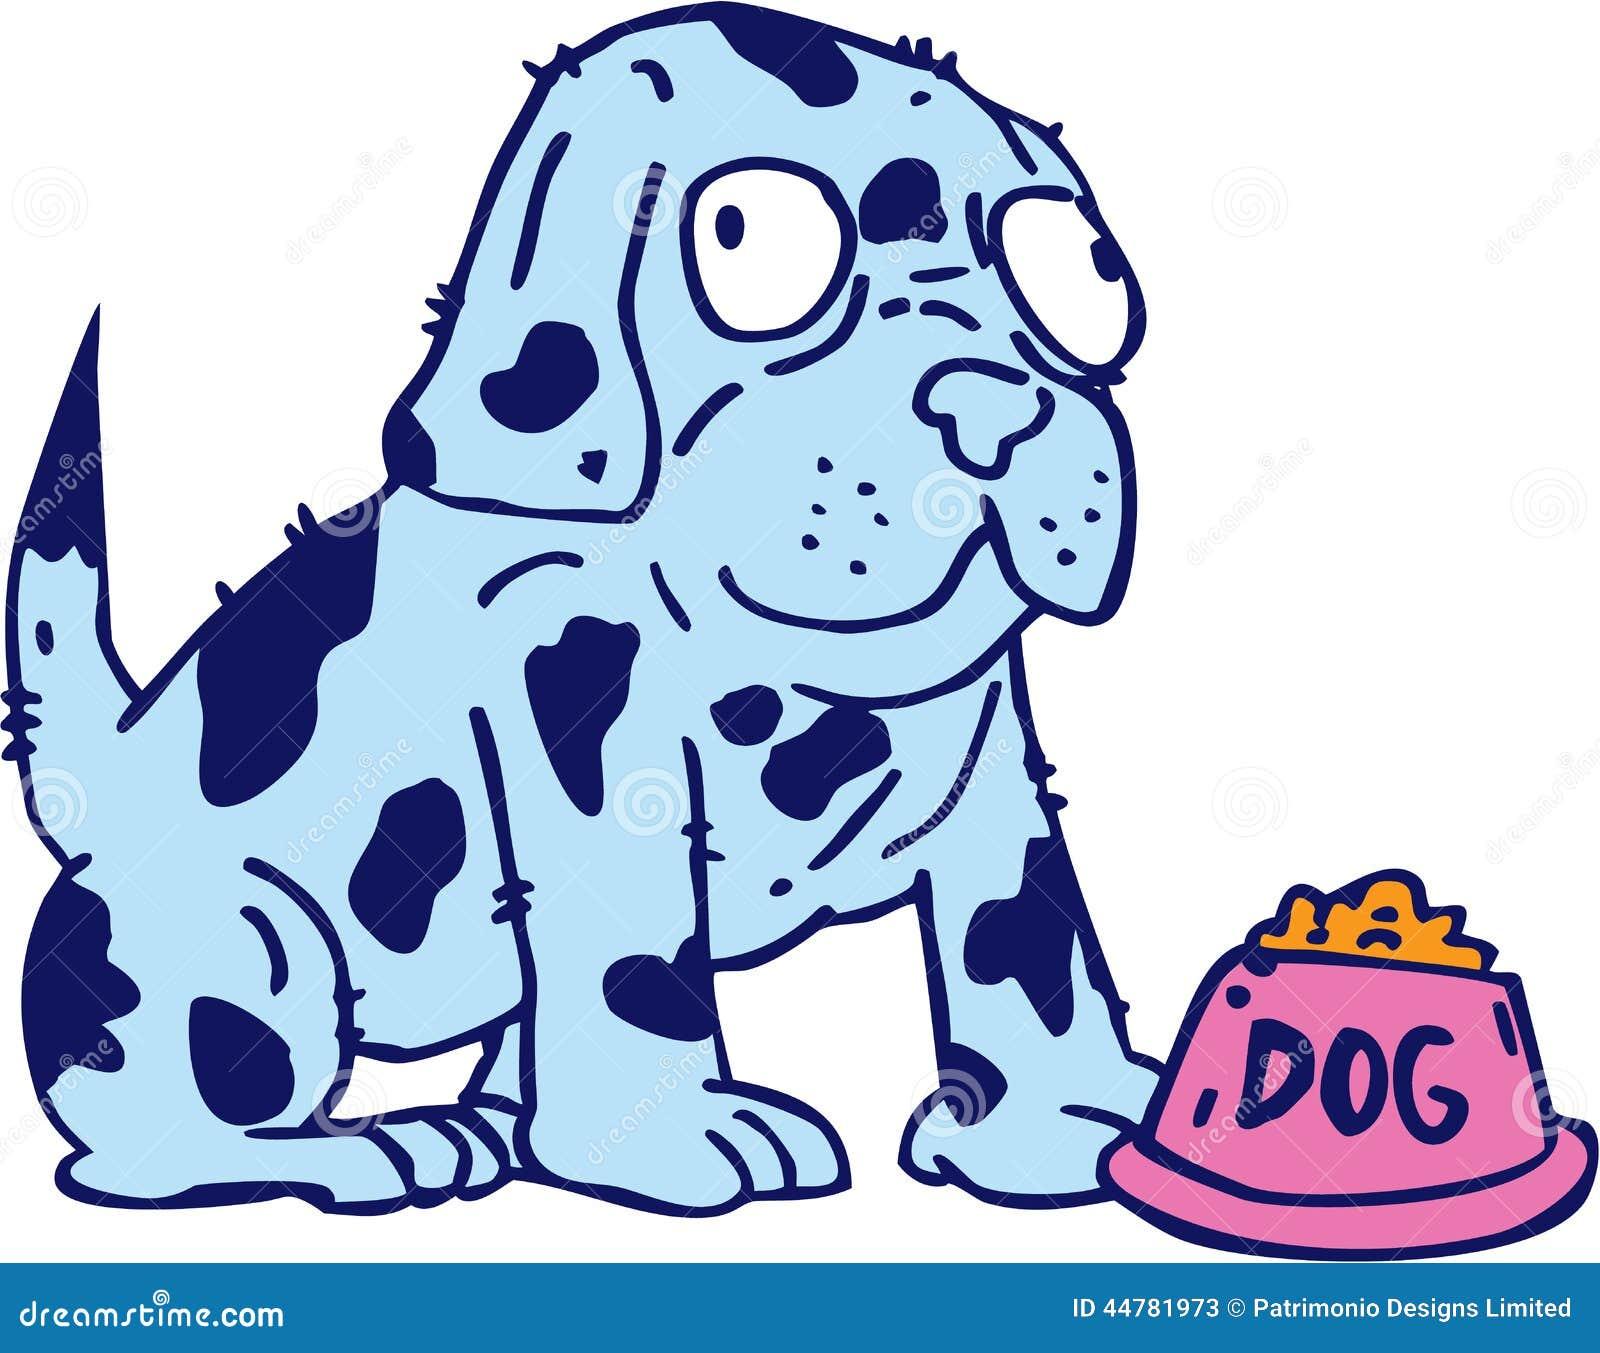 Raw Dog Food Black Friday